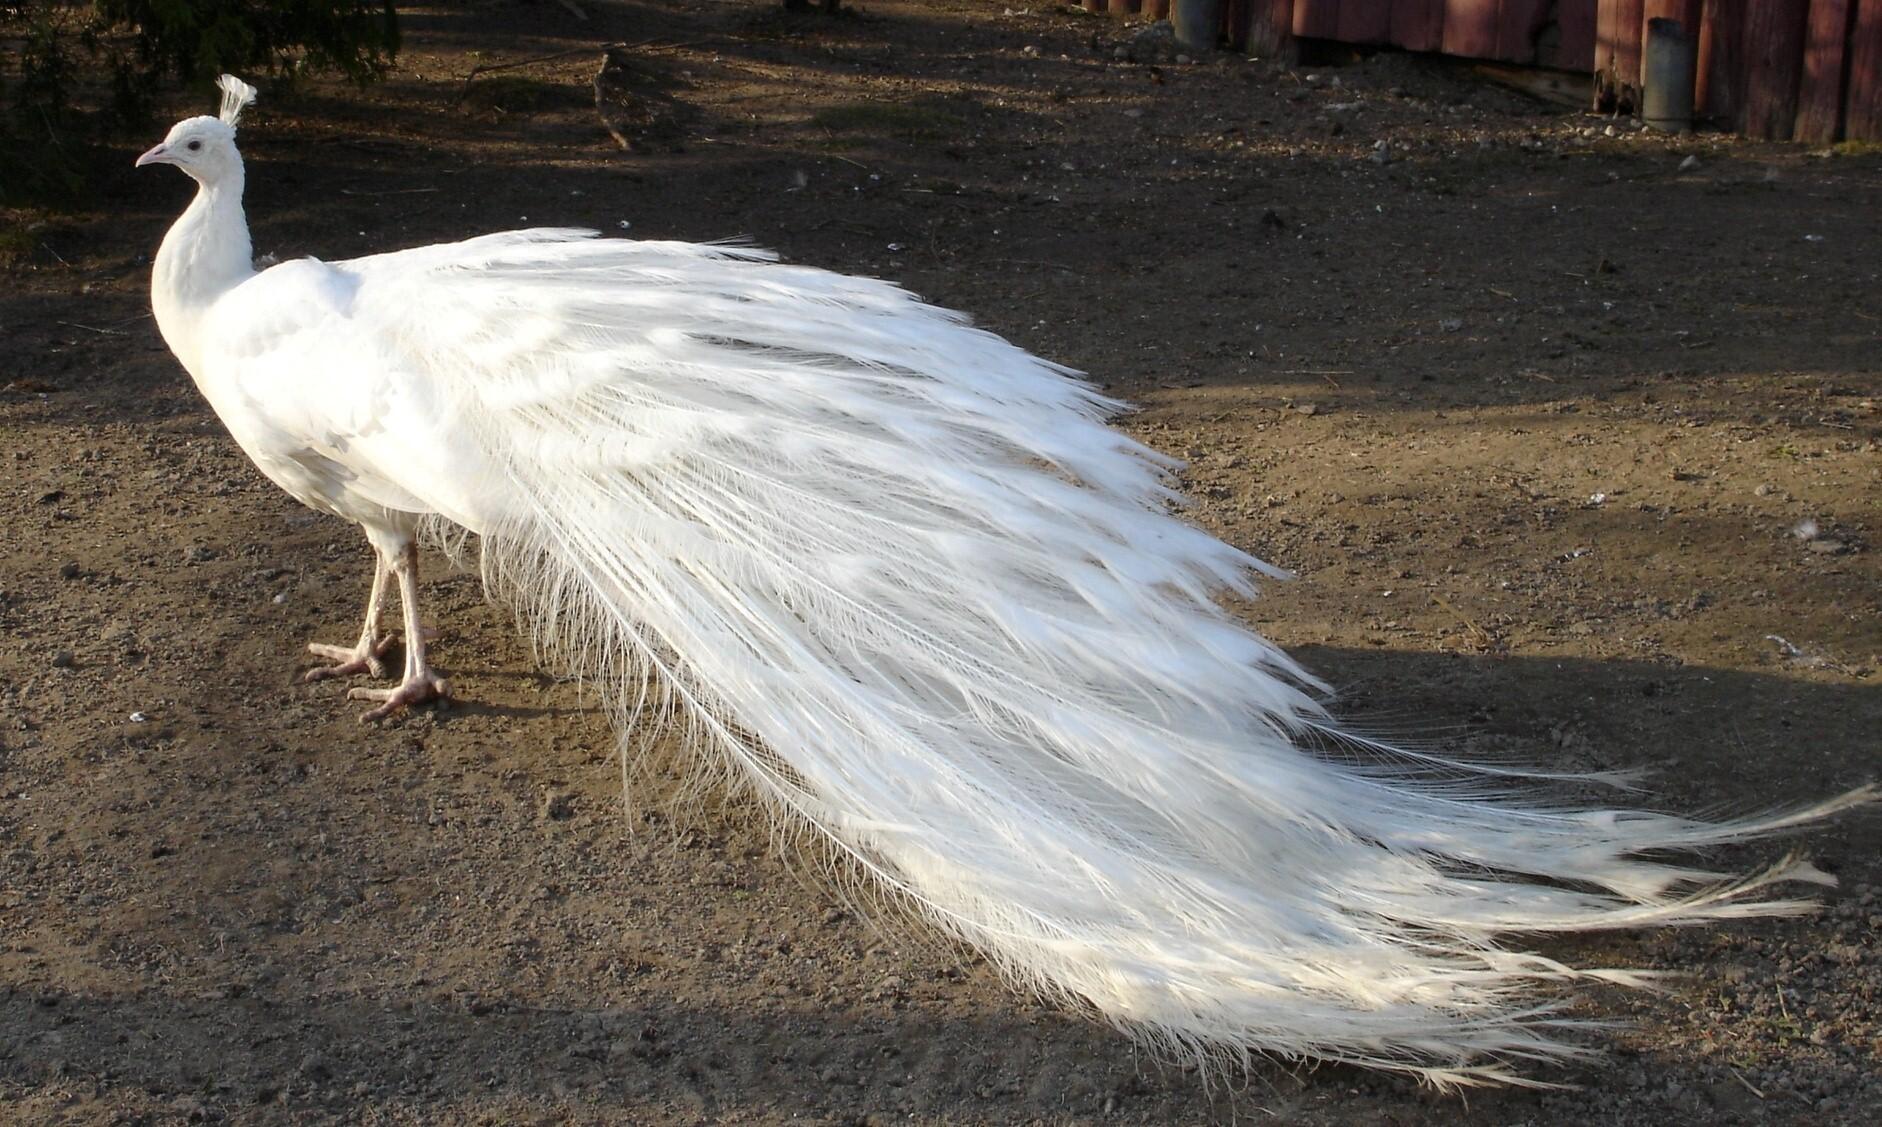 Beautiful_White_Peacock_Bird_Image.jpg